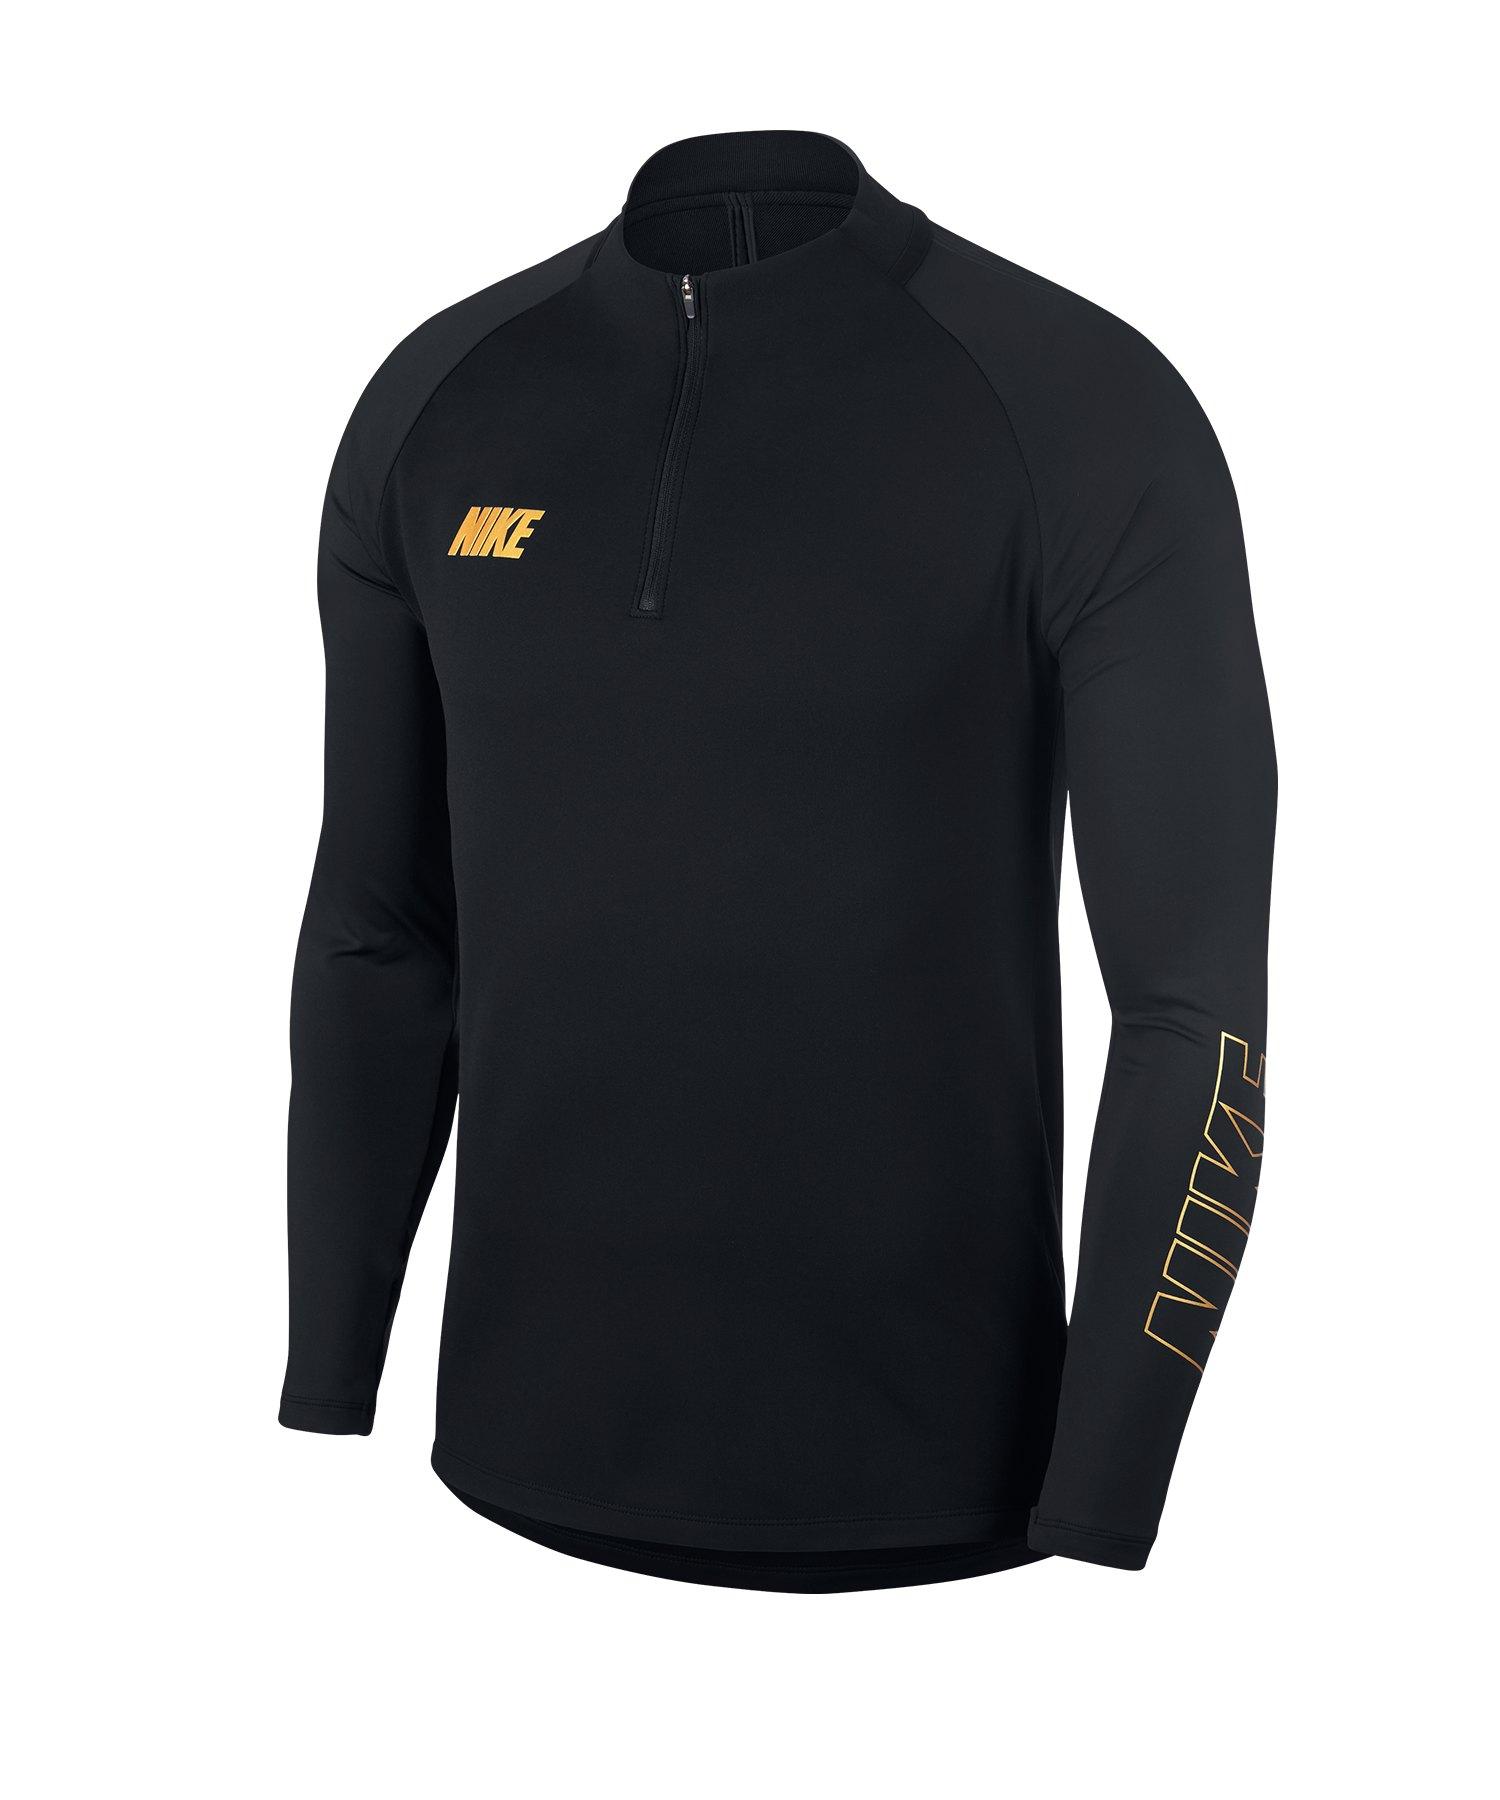 Nike Squad 19 Drill Top Sweatshirt Schwarz F015 - schwarz